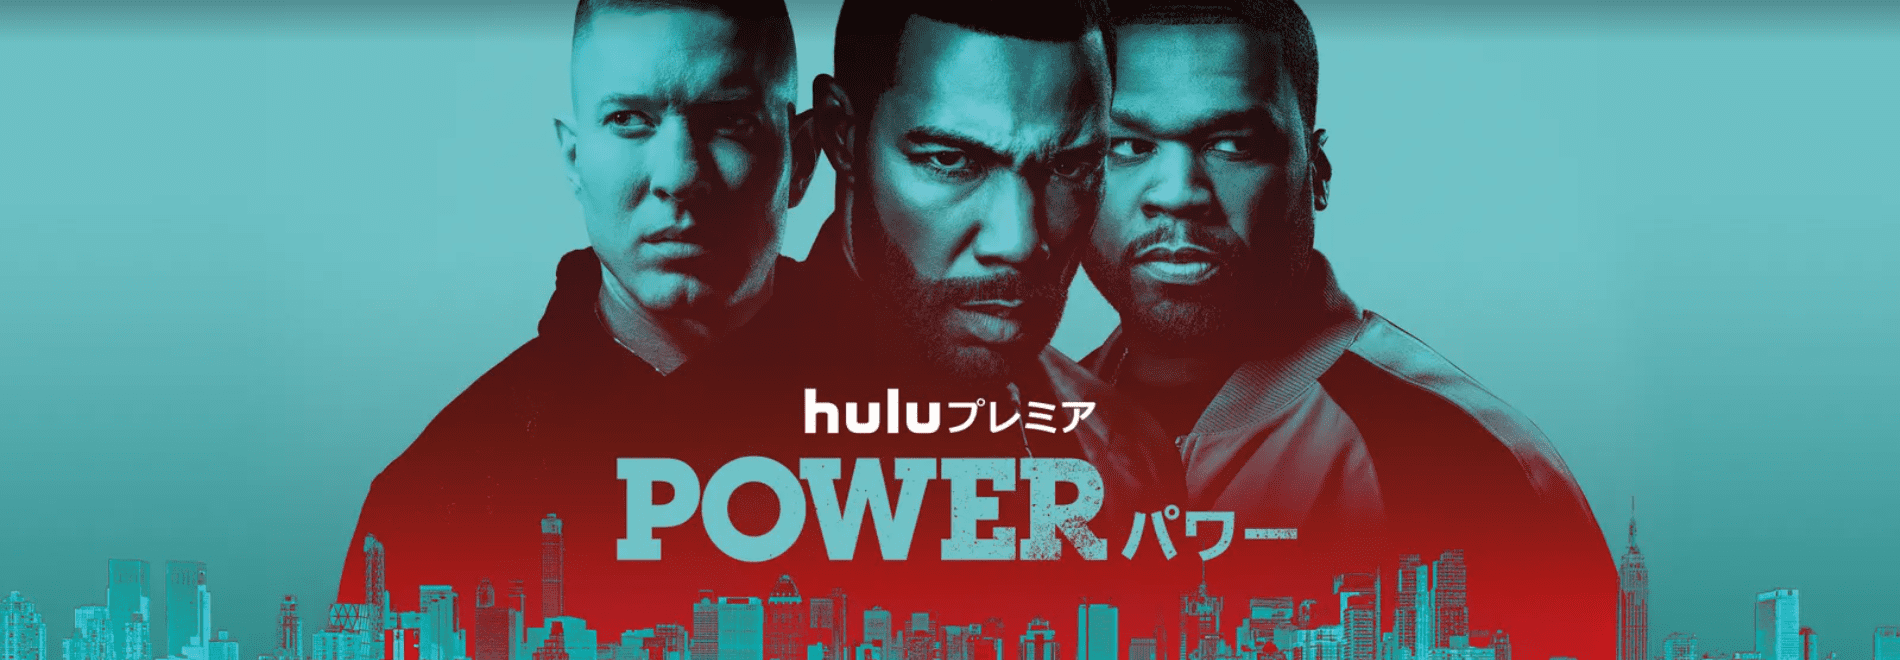 【Huluおすすめ作品まとめ】Hulu6万本の見放題作品の中からおすすめタイトルを厳選!フールーのおすすめ動画ラインナップをご紹介|最新のHulu動画ラインナップ:POWER/パワー シーズン6